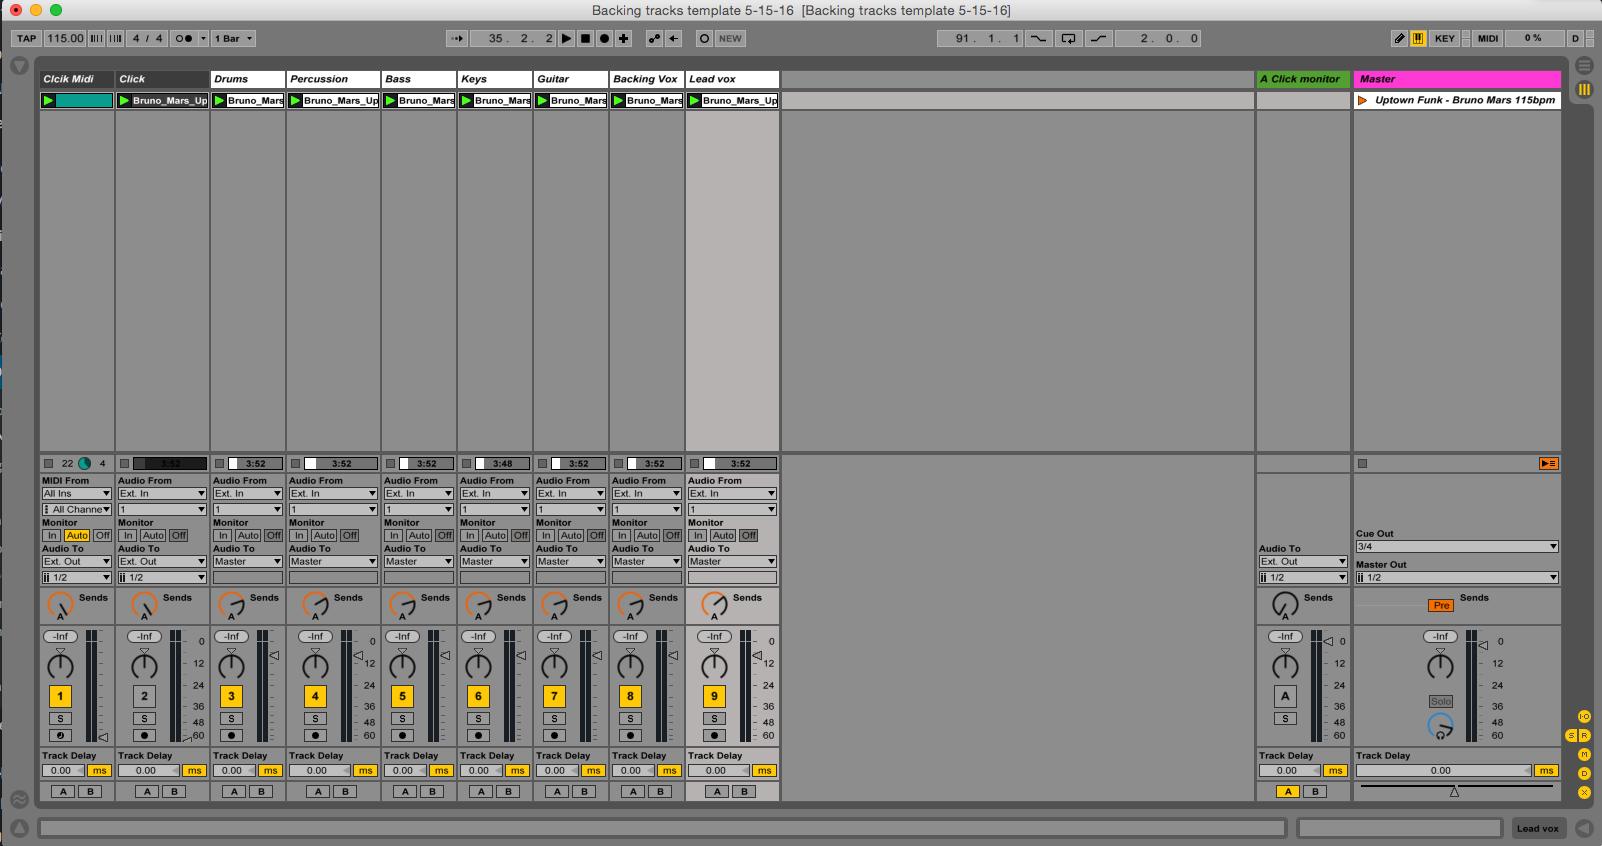 Ableton 9.5 & up Backing Tracks Template – Jetset Sound